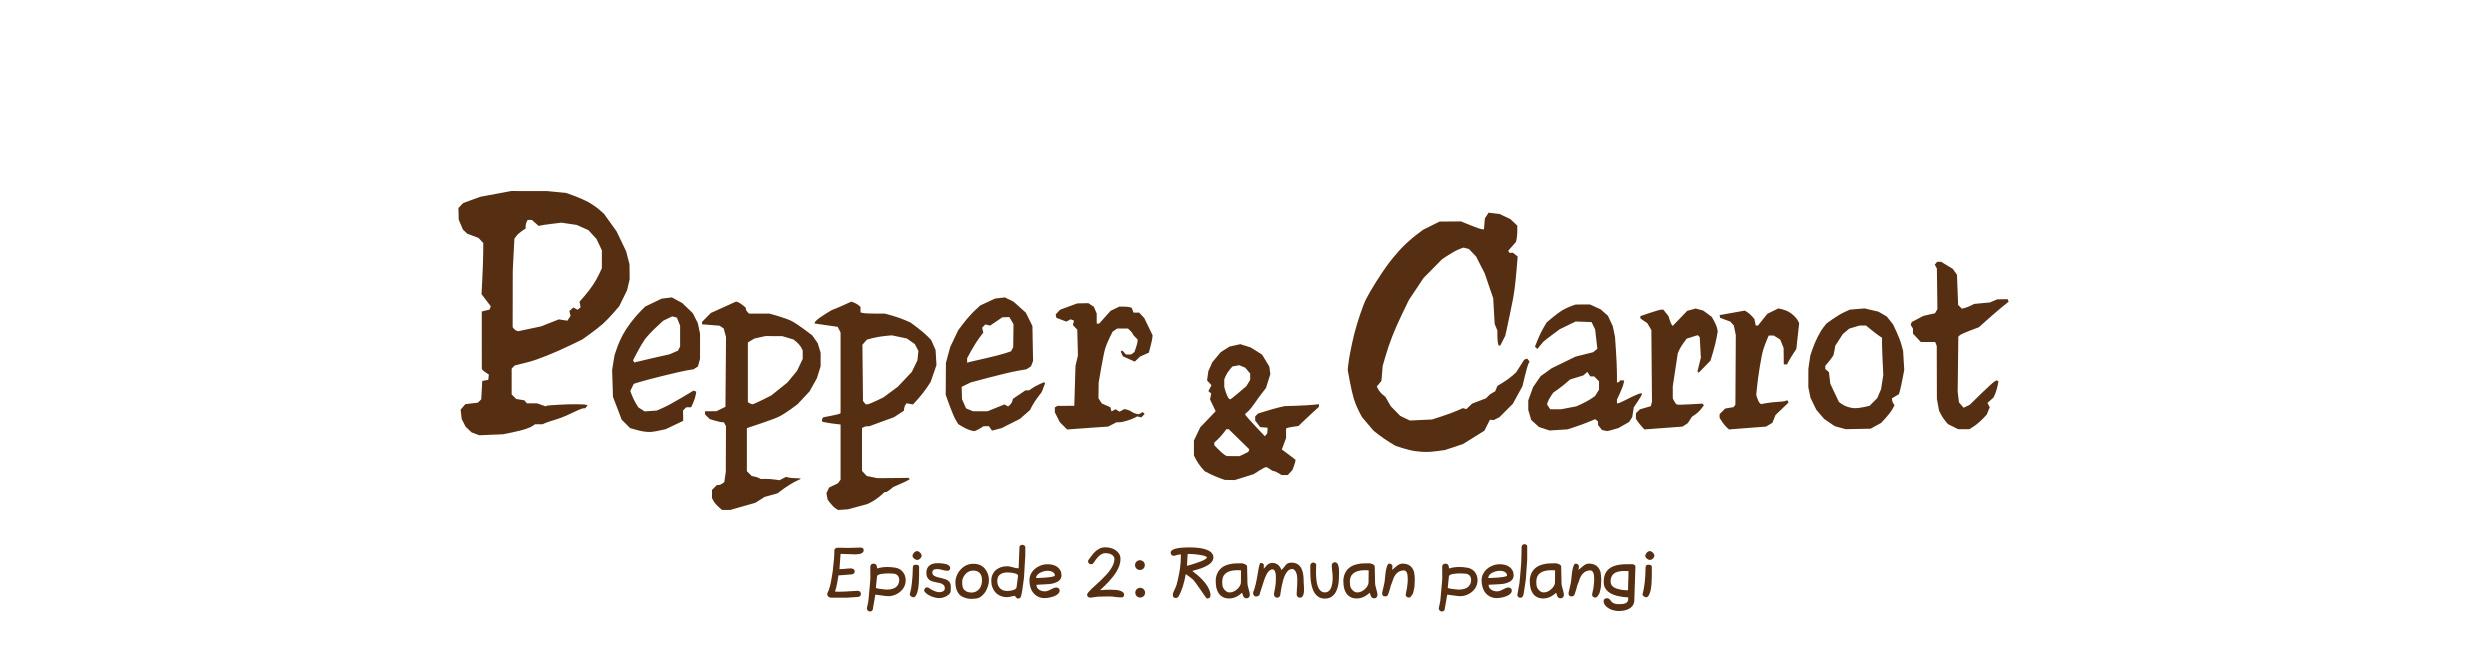 Episode 2: Ramuan pelangi